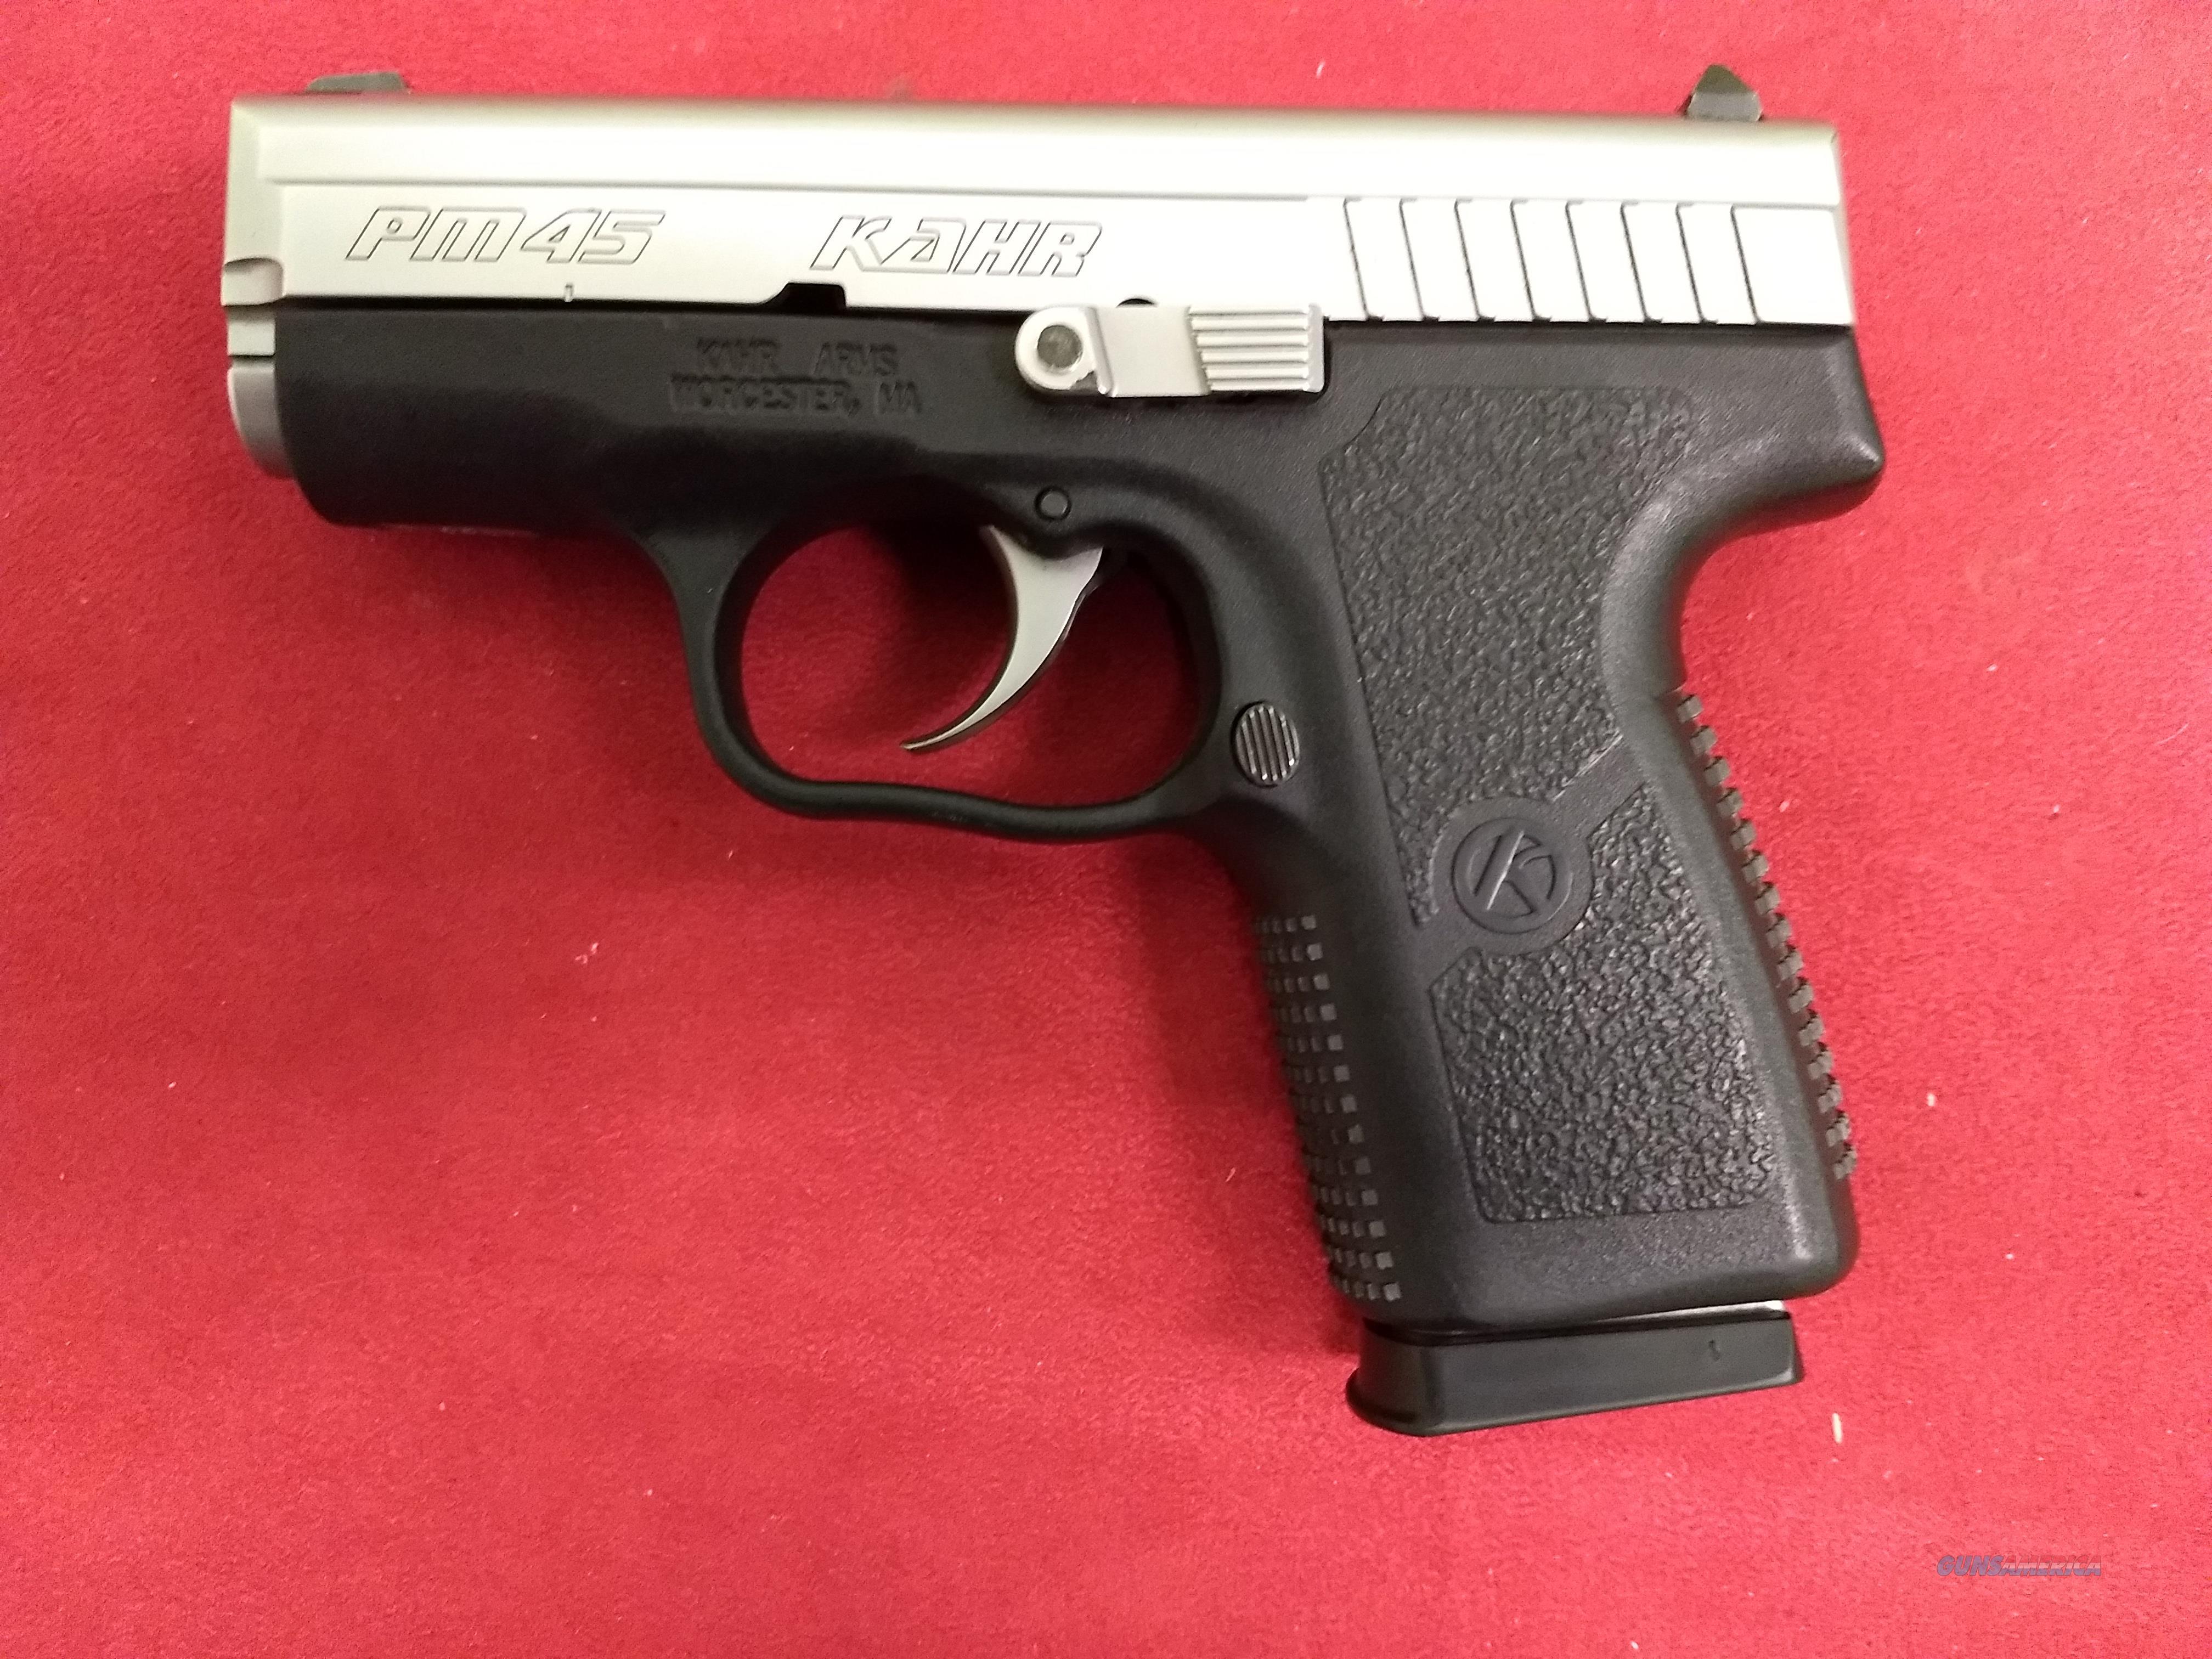 Kahr PM45  Guns > Pistols > Kahr Pistols